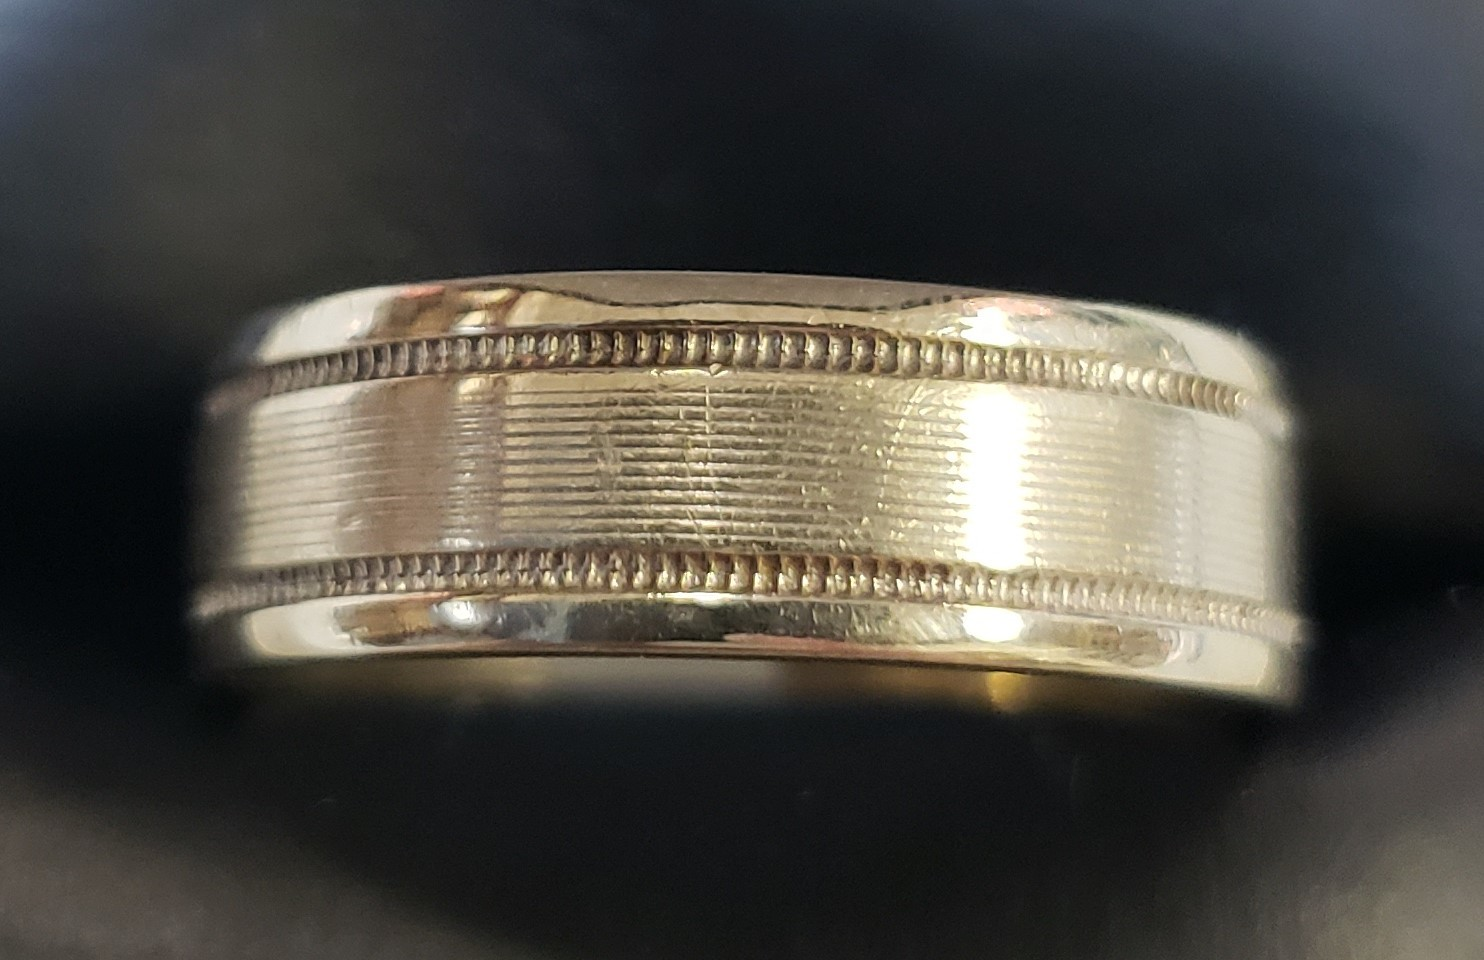 14KT - WHITE GOLD - SIZE 10.5 - 5/16